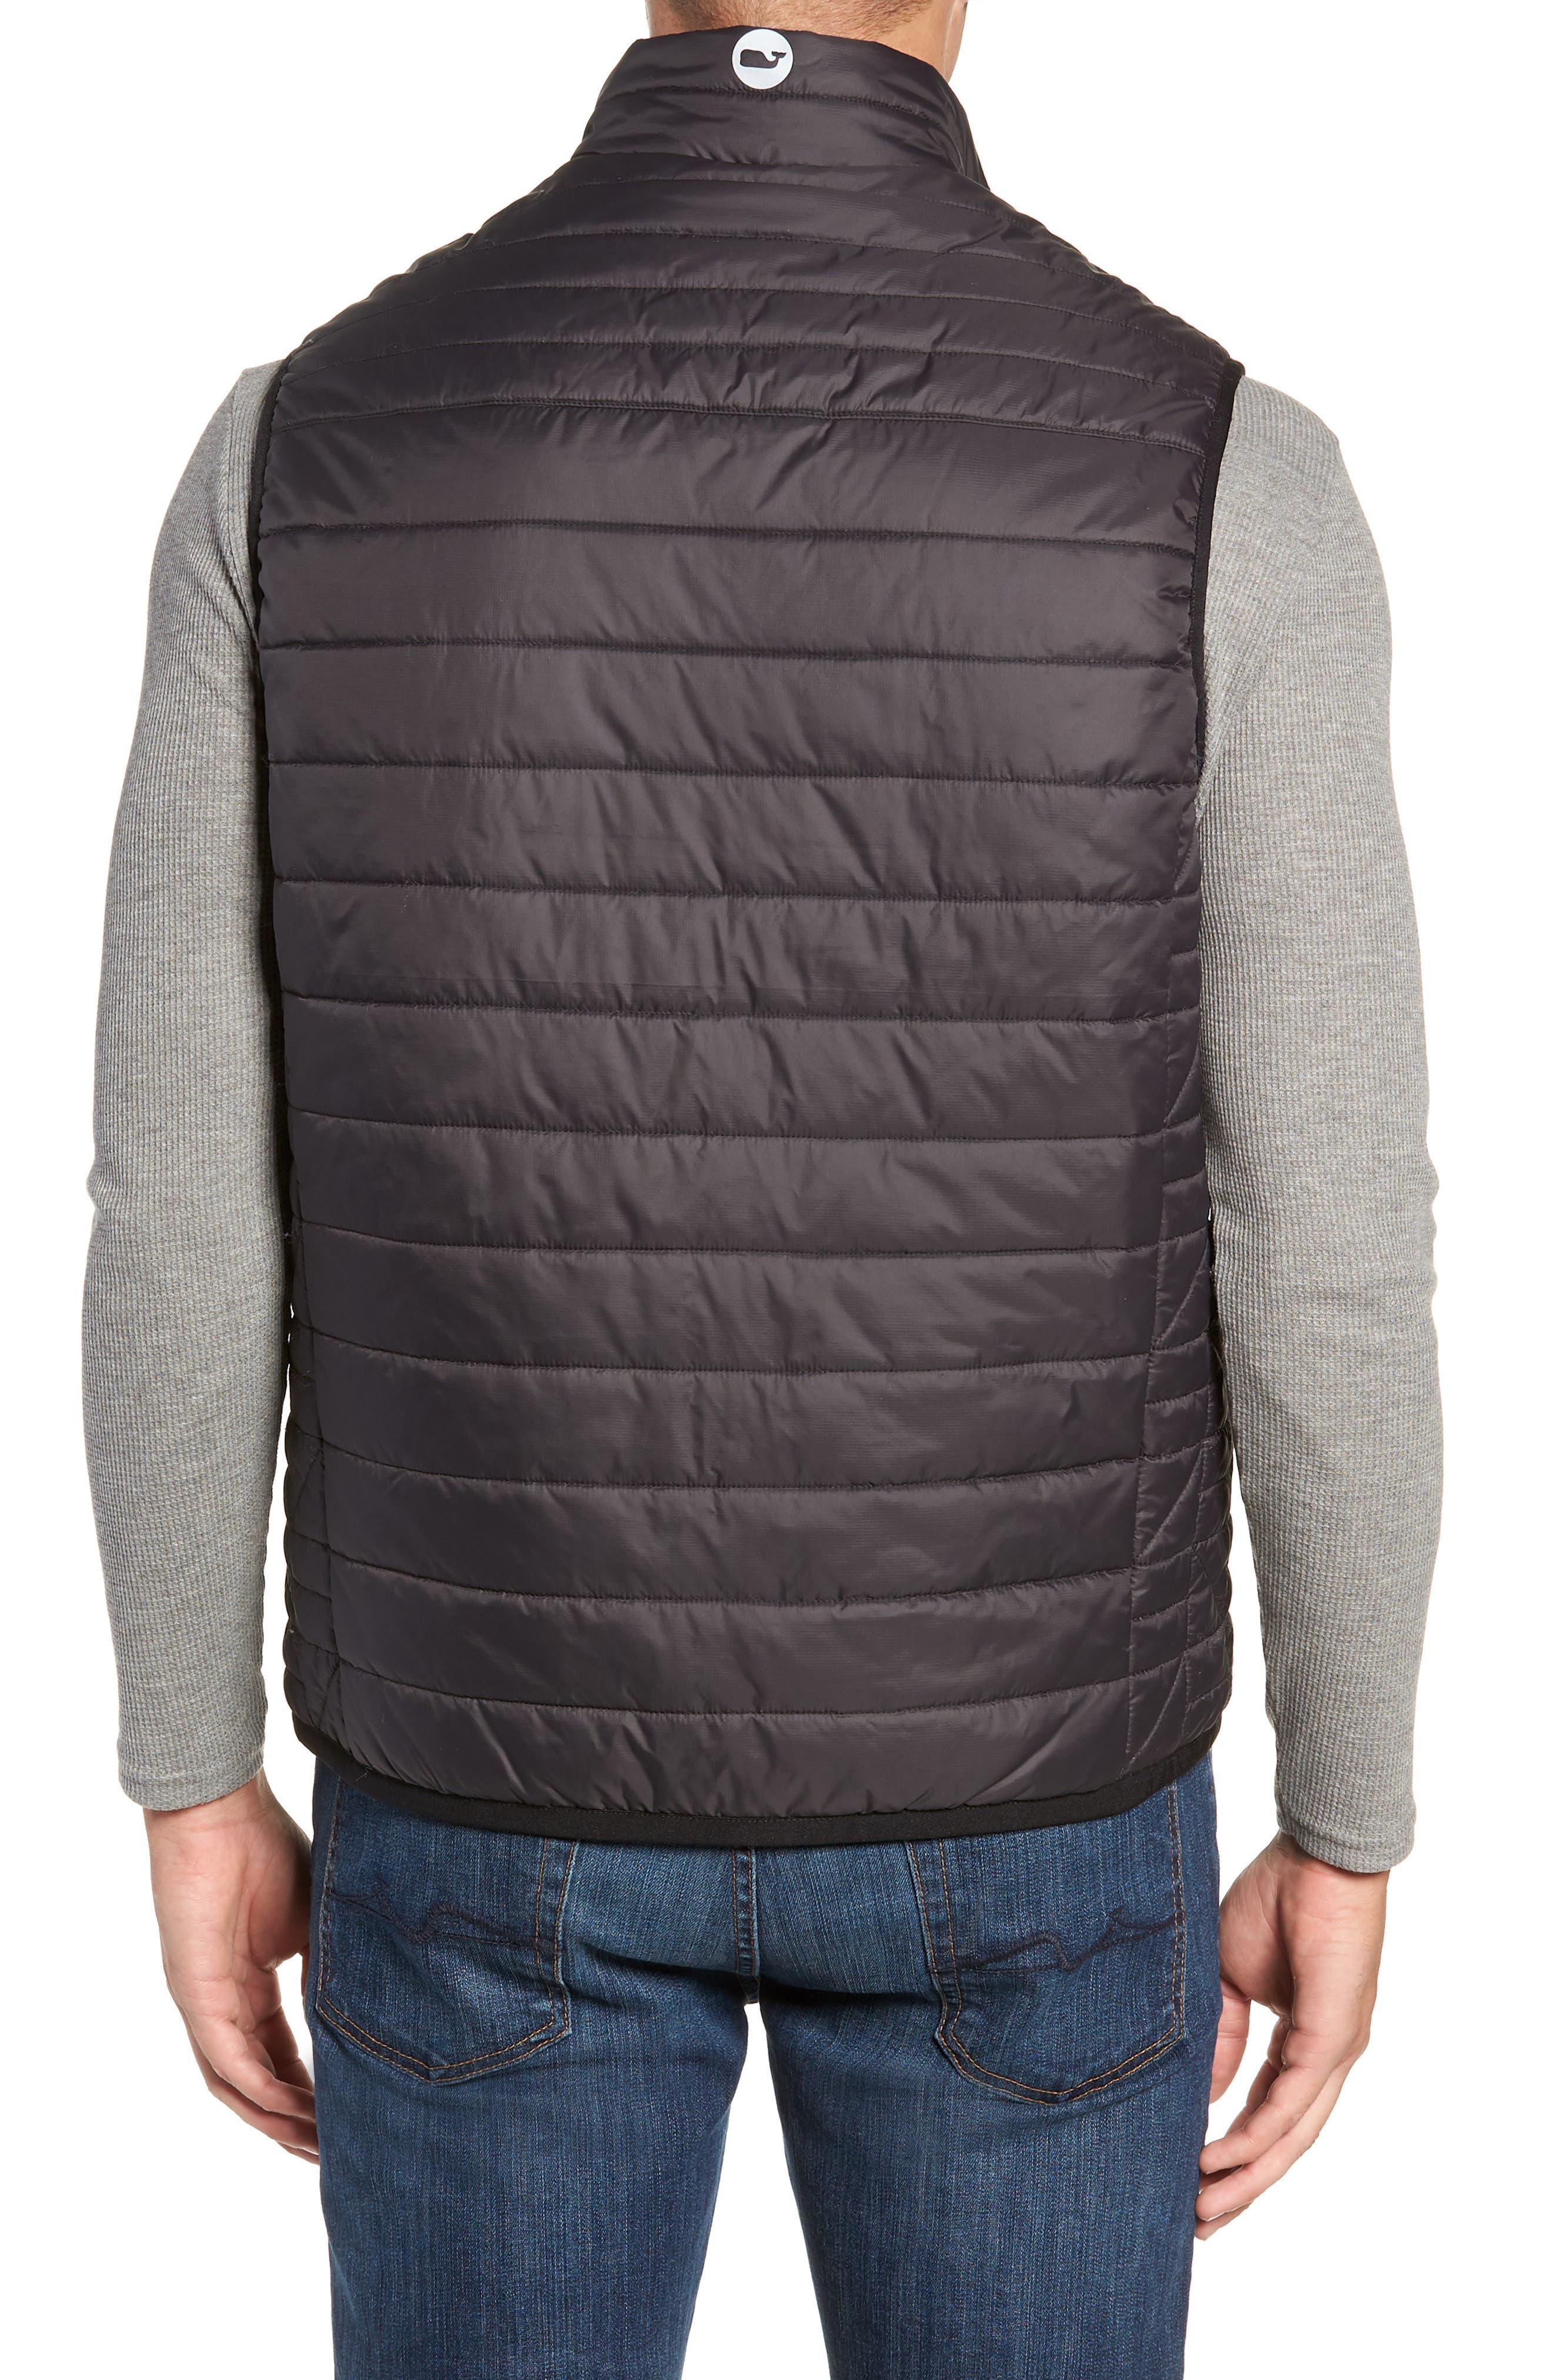 VINEYARD VINES,                             Regular Fit Down Mountain Vest,                             Alternate thumbnail 2, color,                             002